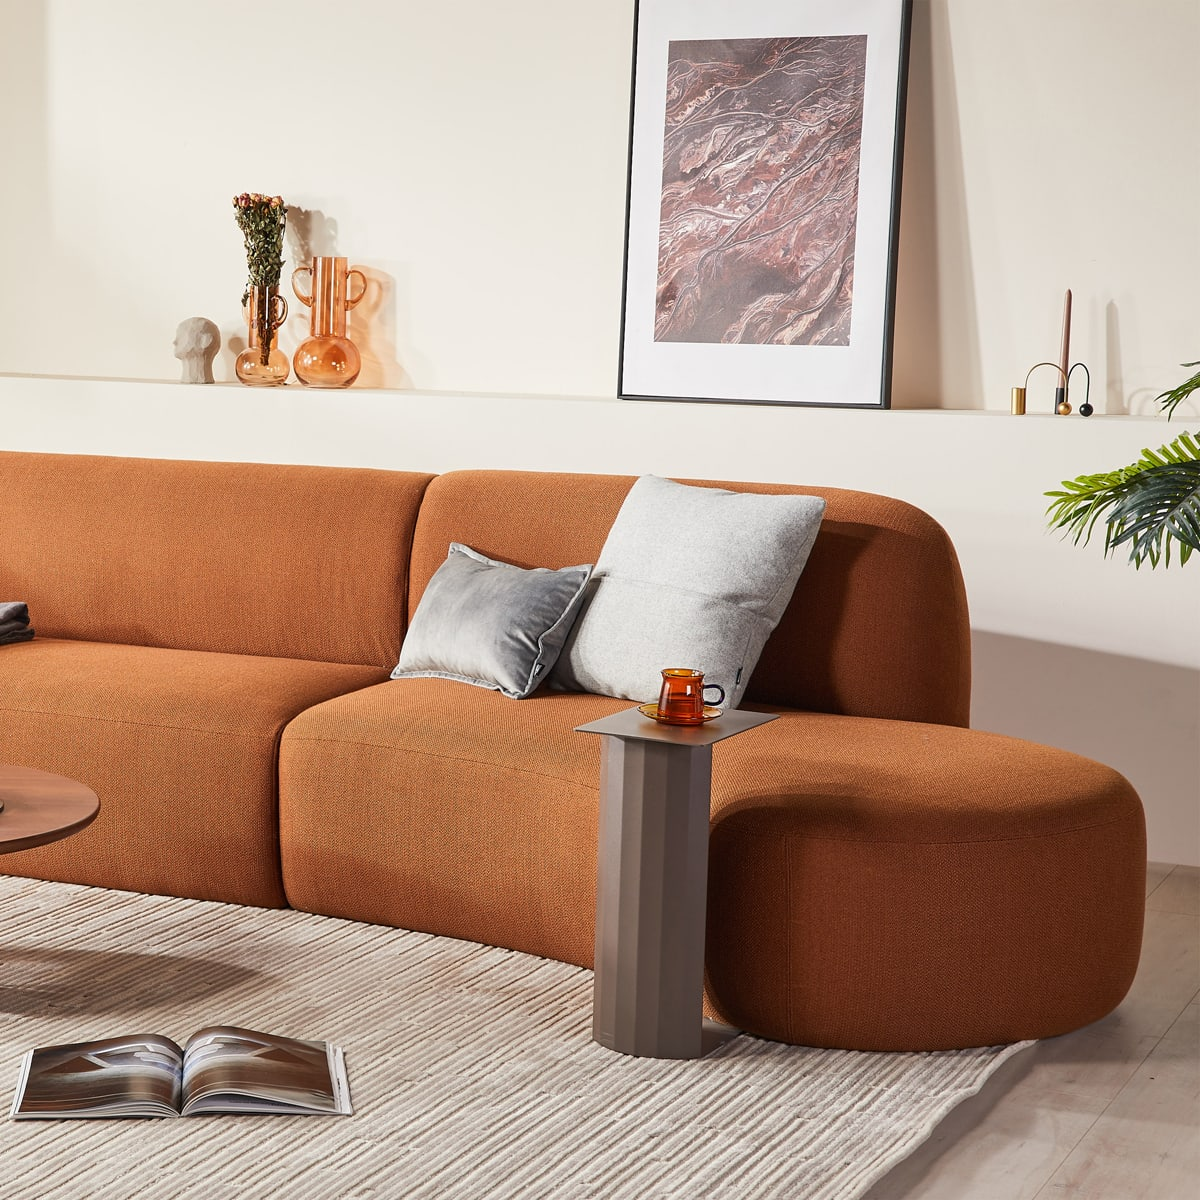 Swell Chaise Sofa - Terracotta